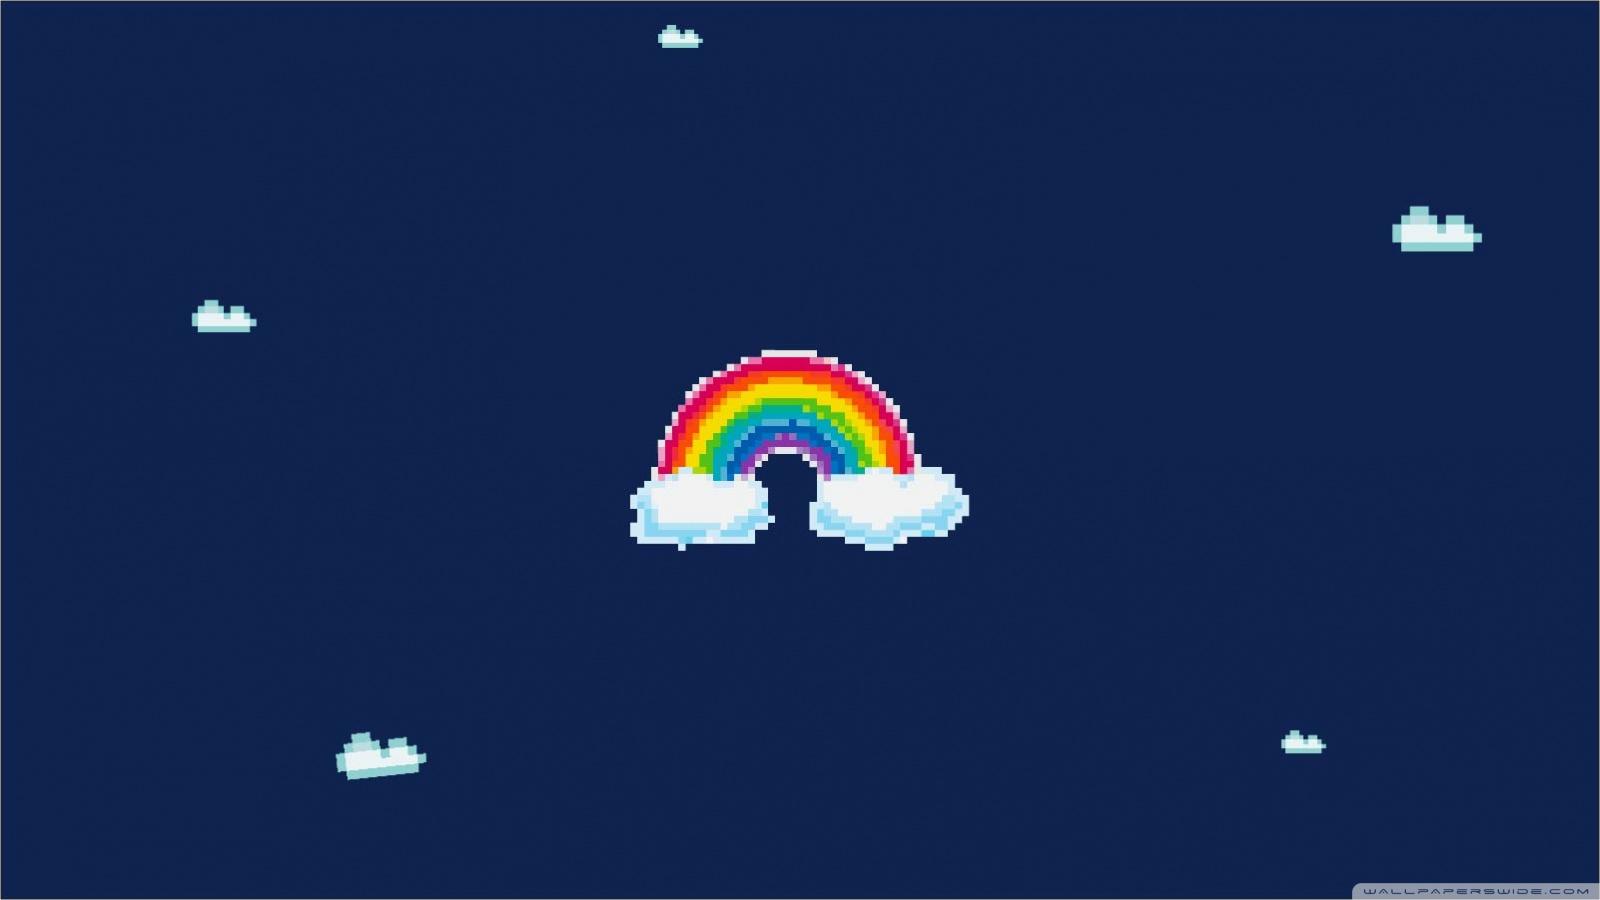 Free Pixel Rainbow phone wallpaper by mysticmi